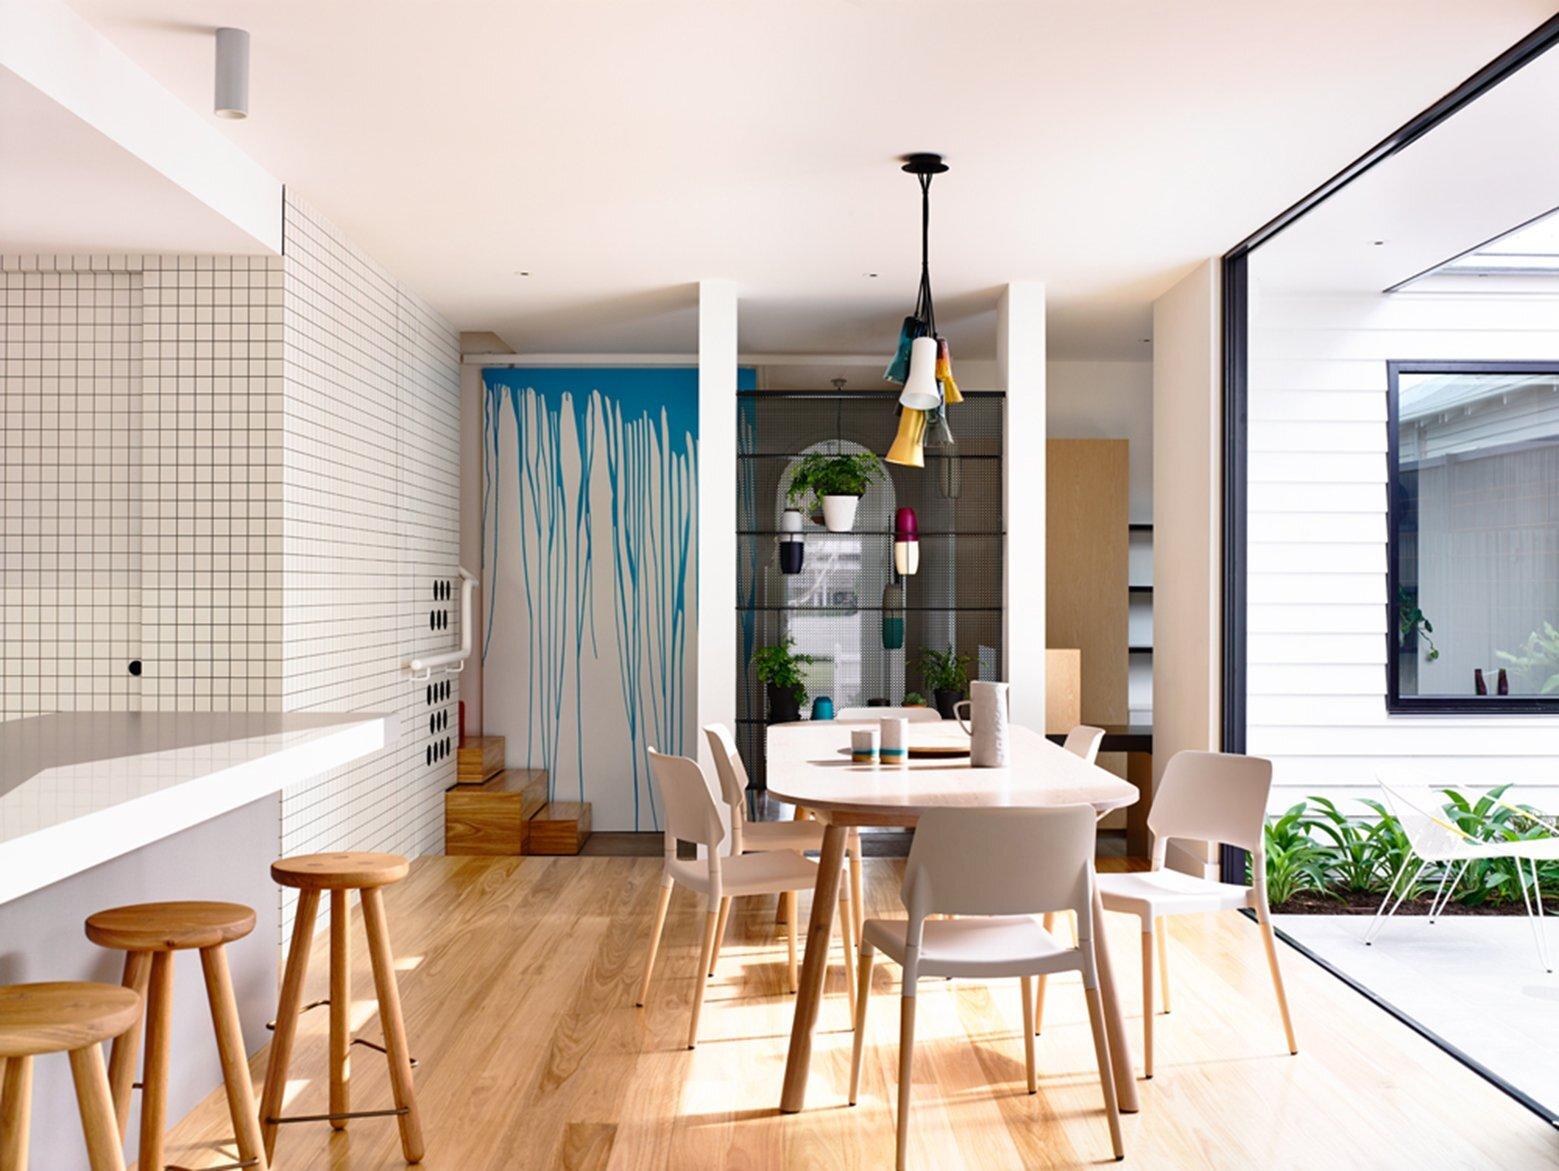 Architecture Design Homes Australia architectural design homes australia | home design